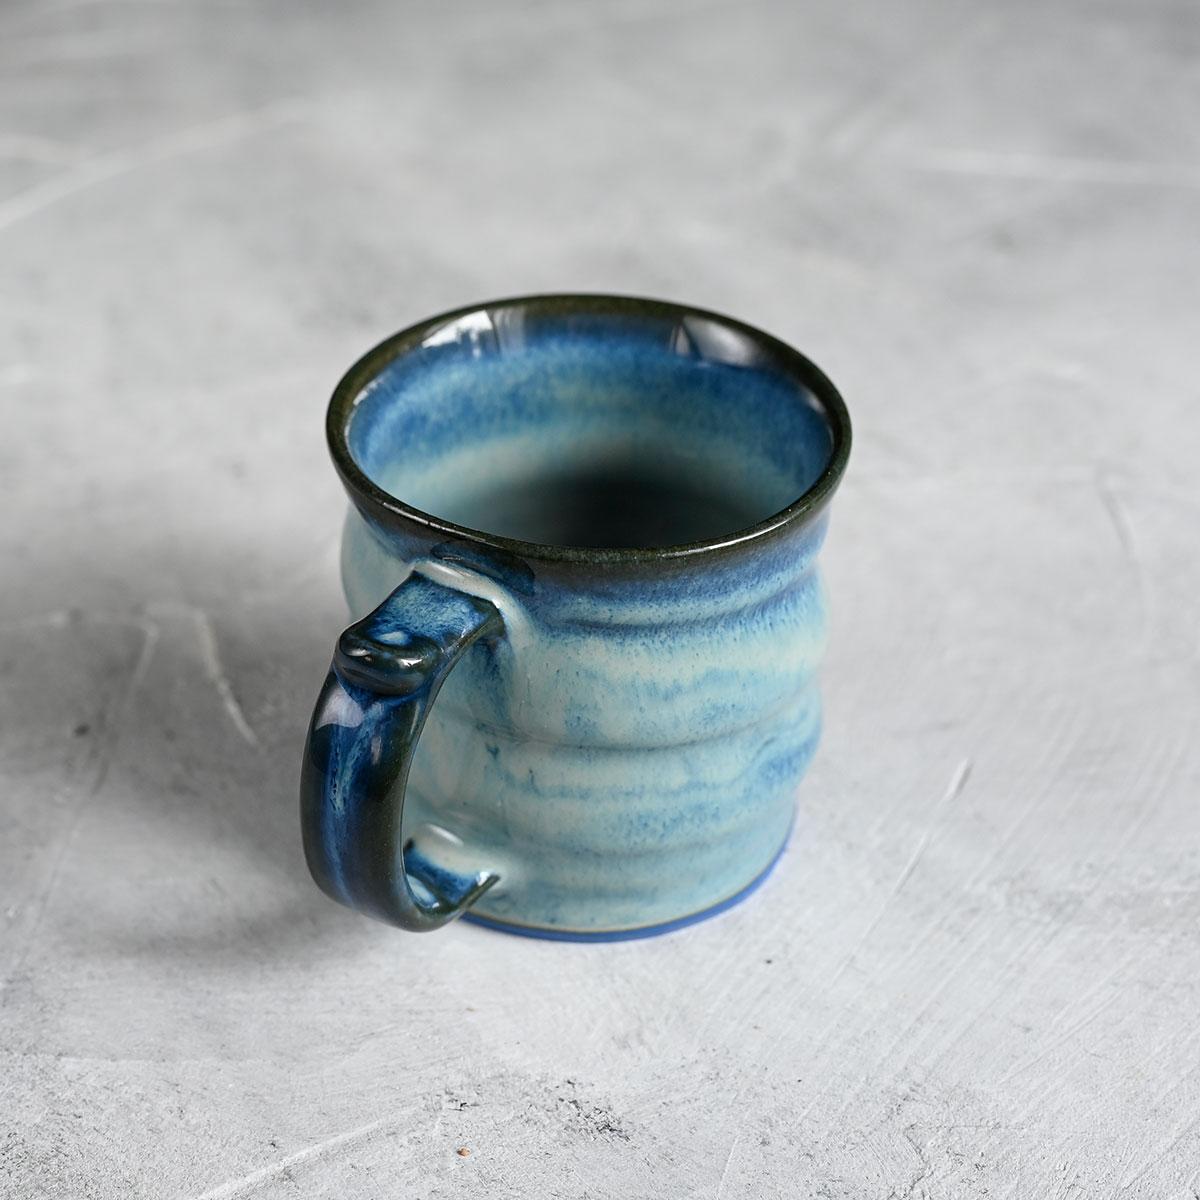 картинка Кружка из синего фарфора малая голубая - DishWishes.Ru